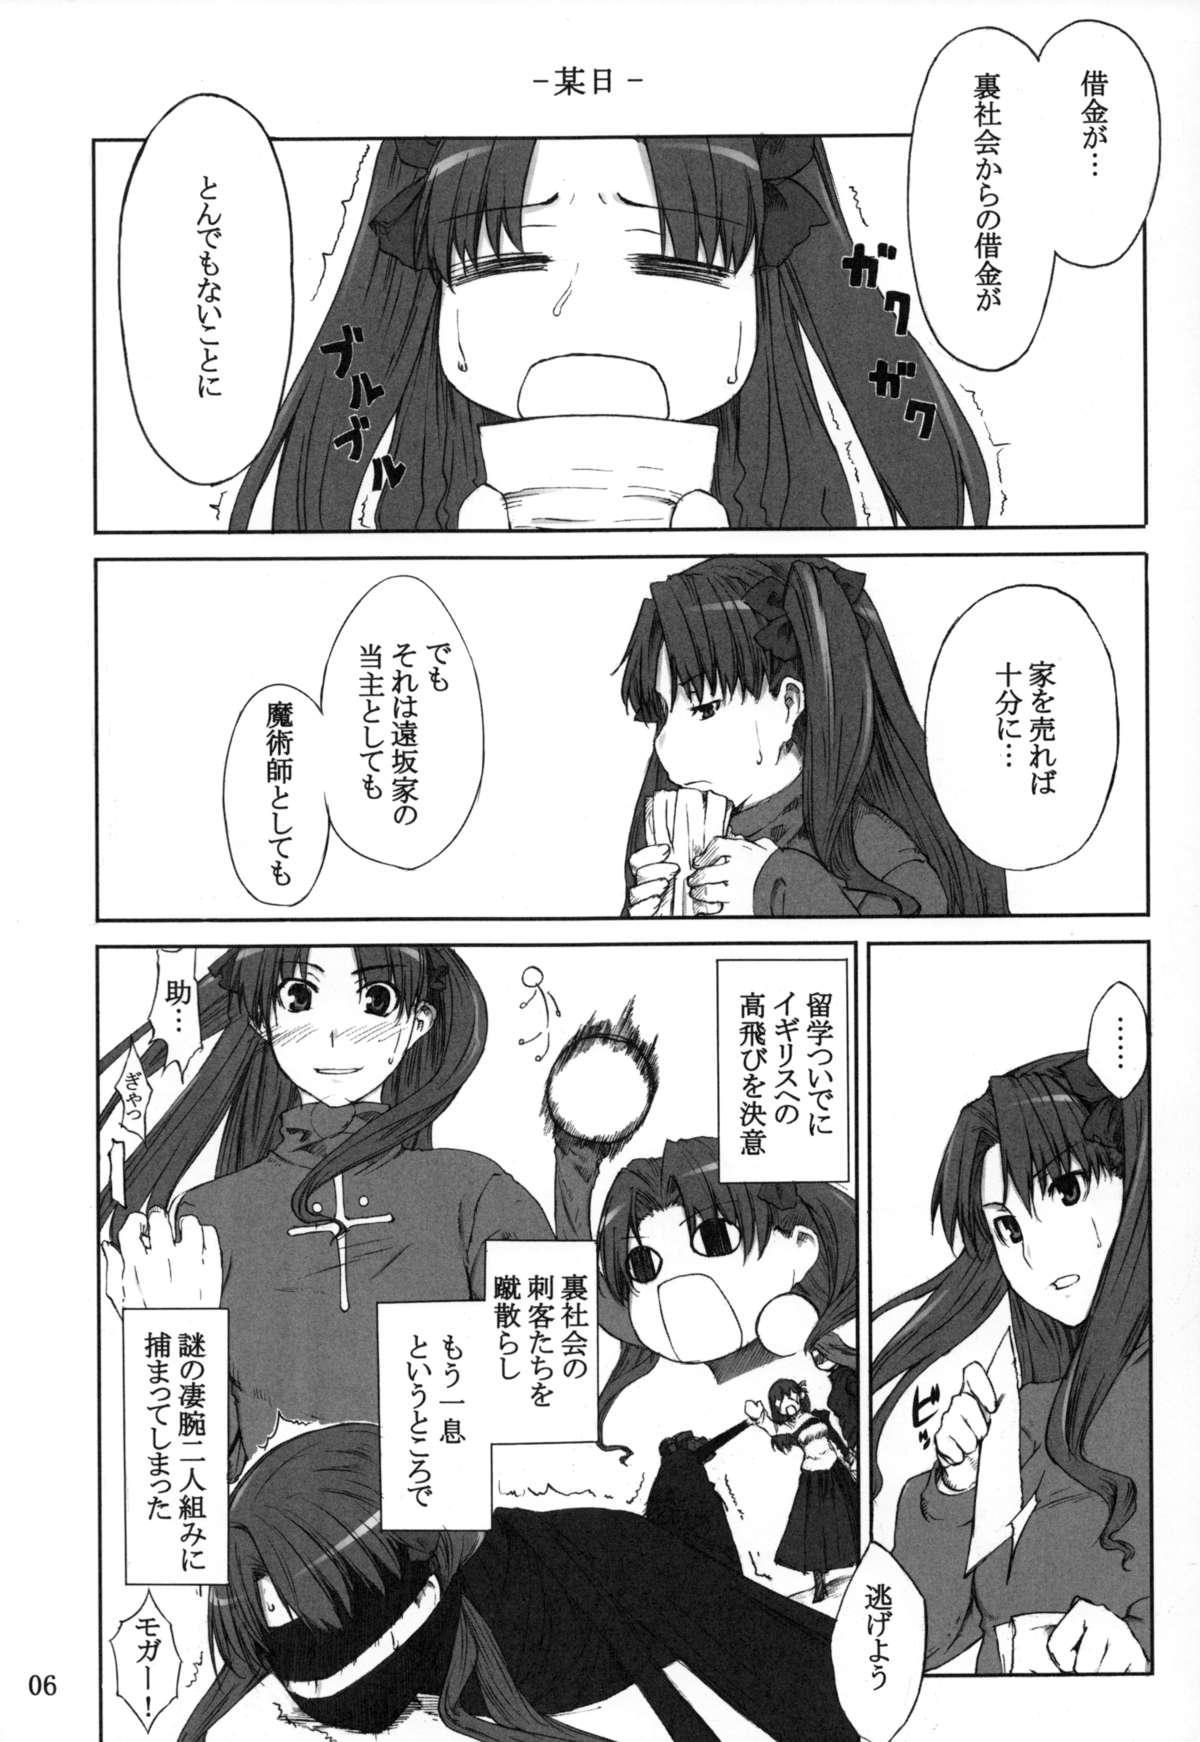 Tosaka-ke no Kakei Jijou Soushuuhen 1 5